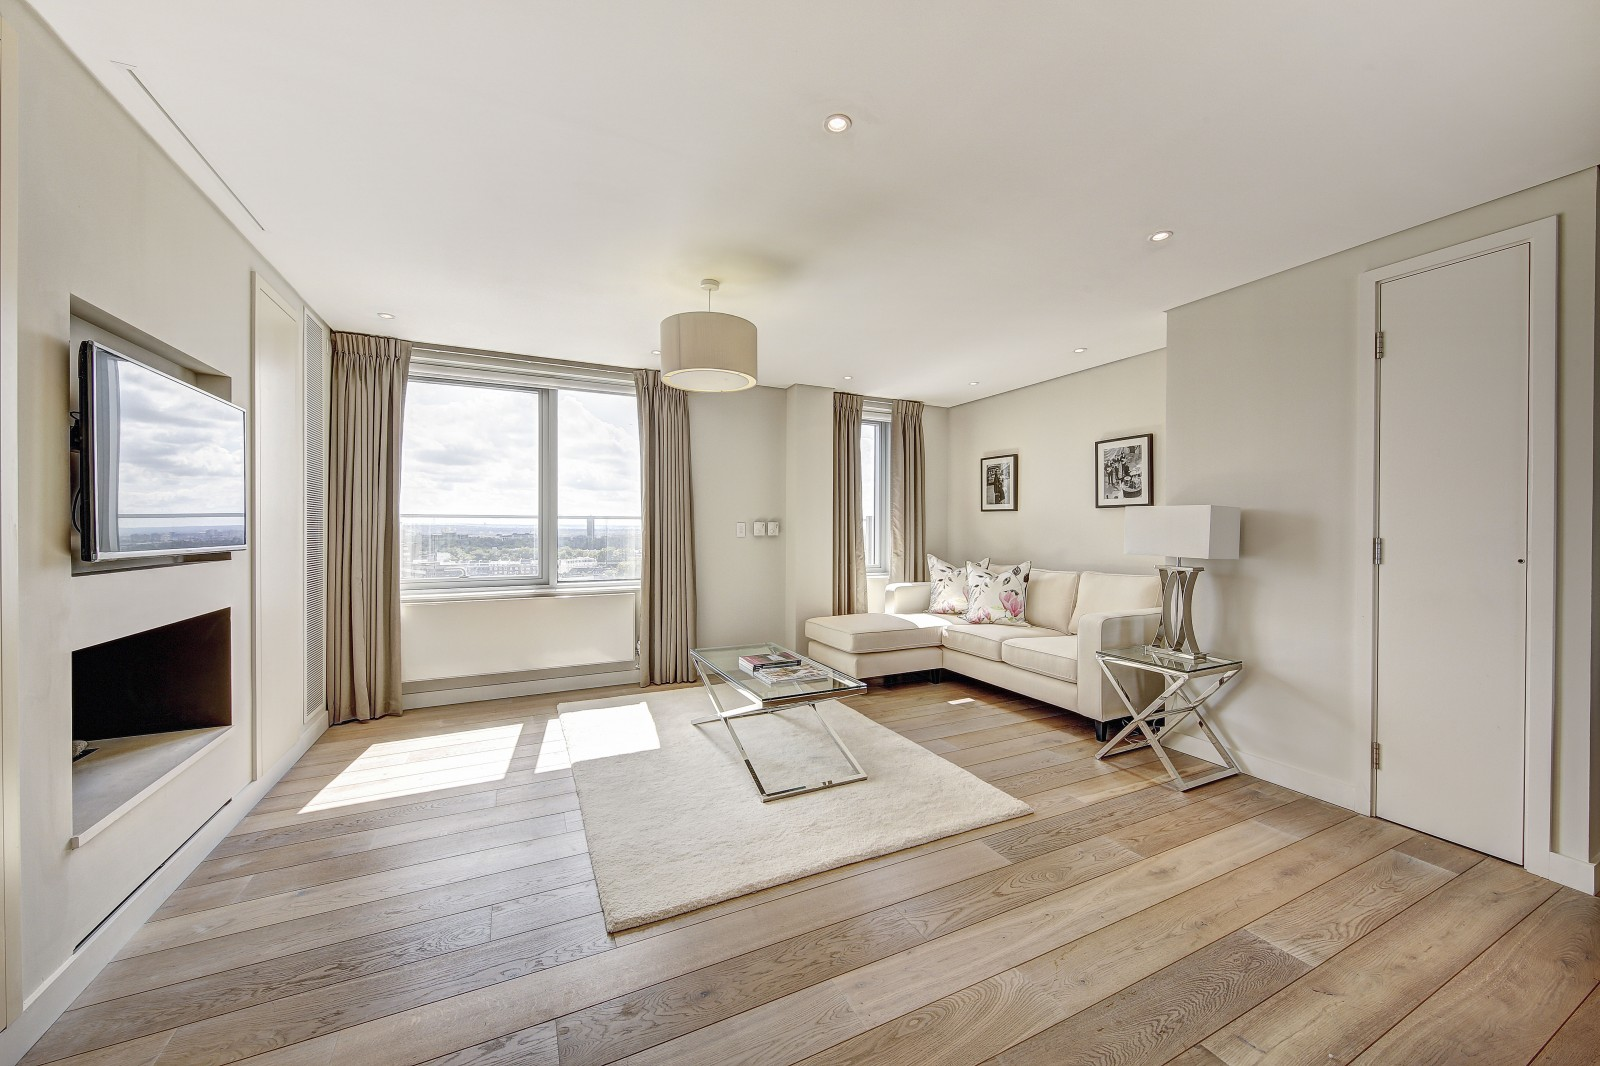 2 Bedroom Apartment To Rent Merchant Square East London W2 1ap